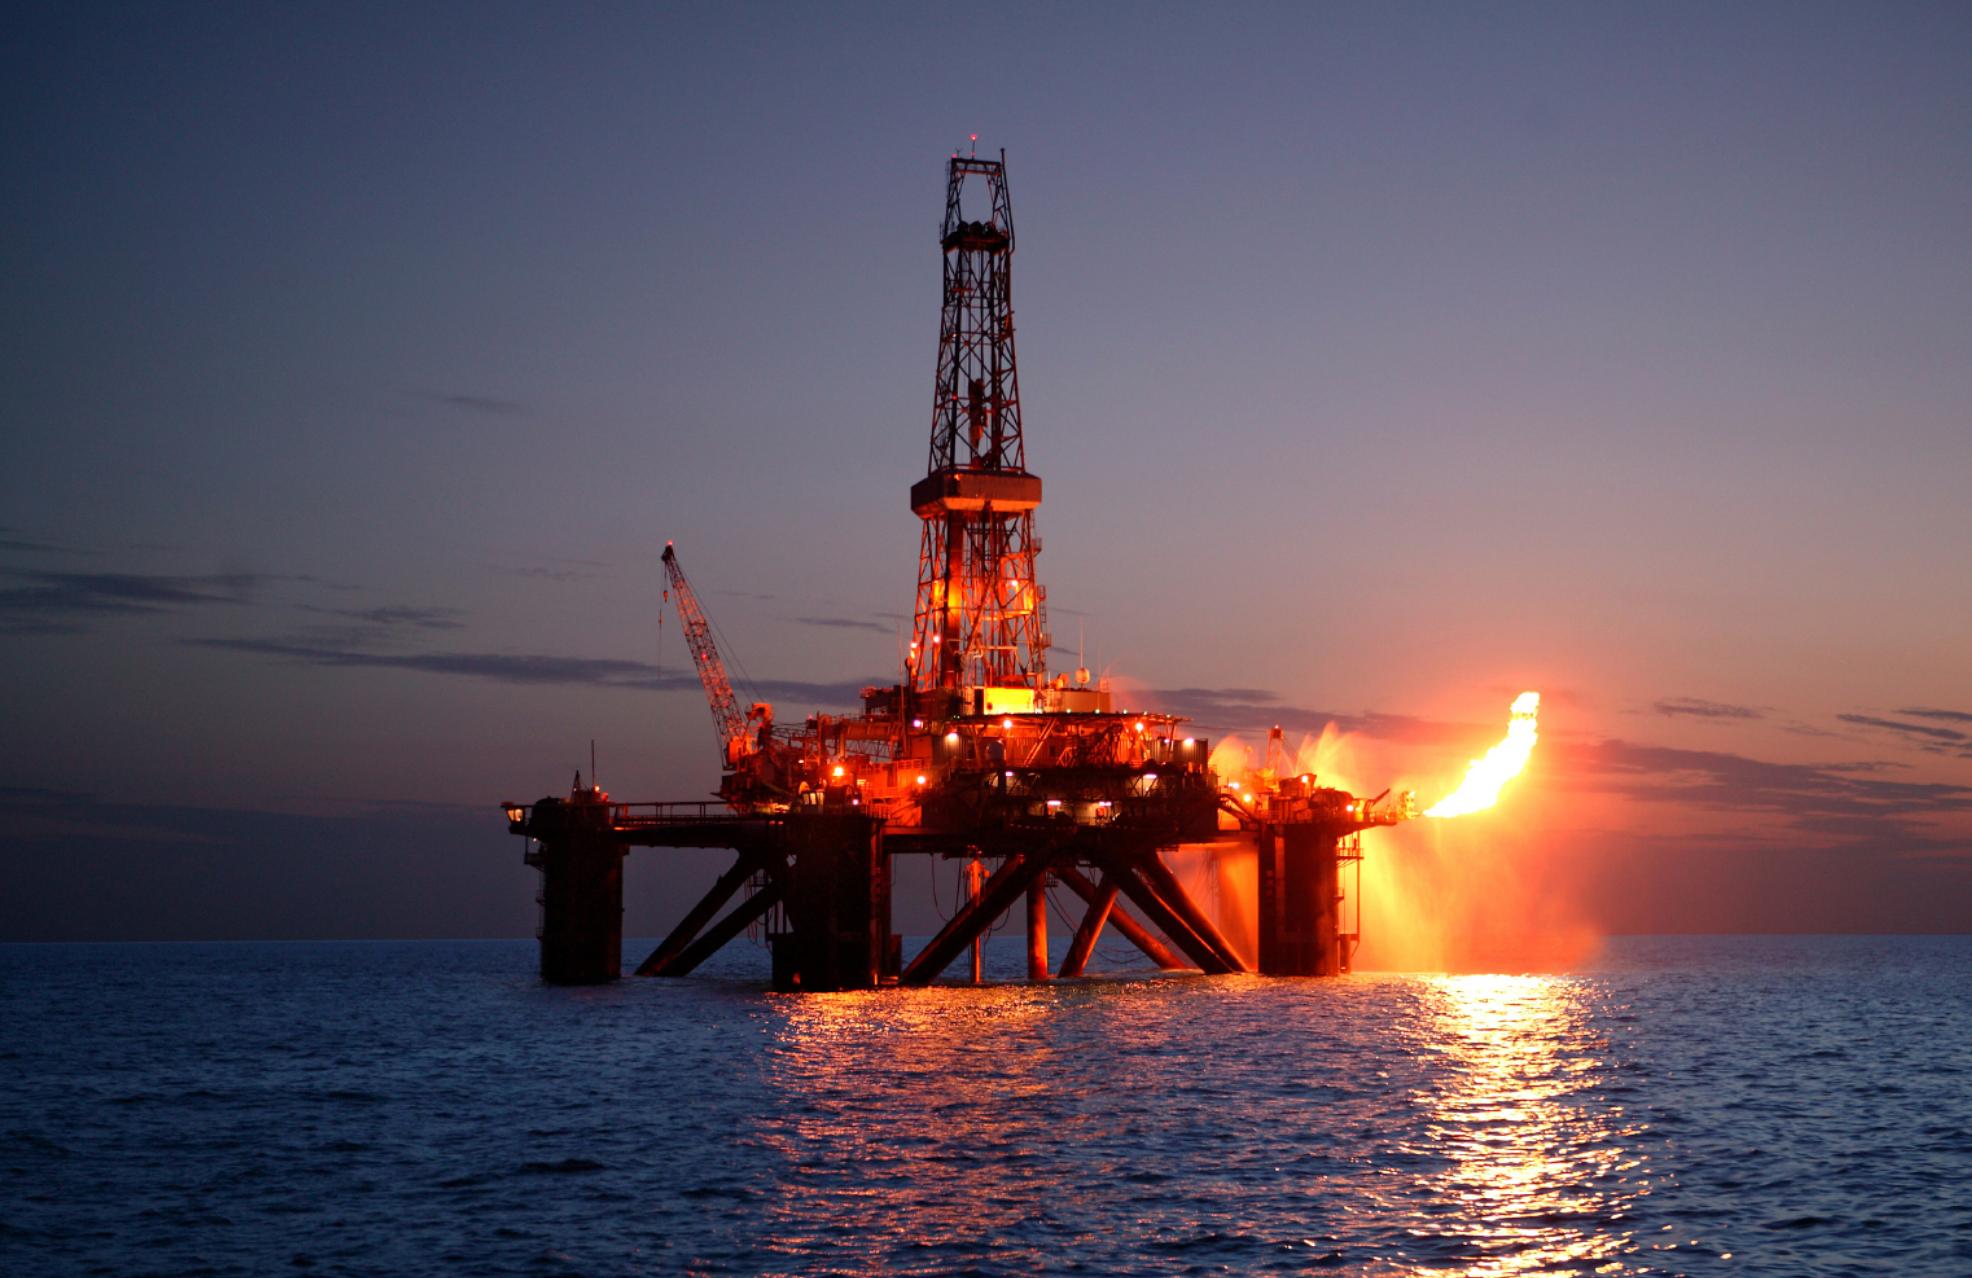 offshore plant fire